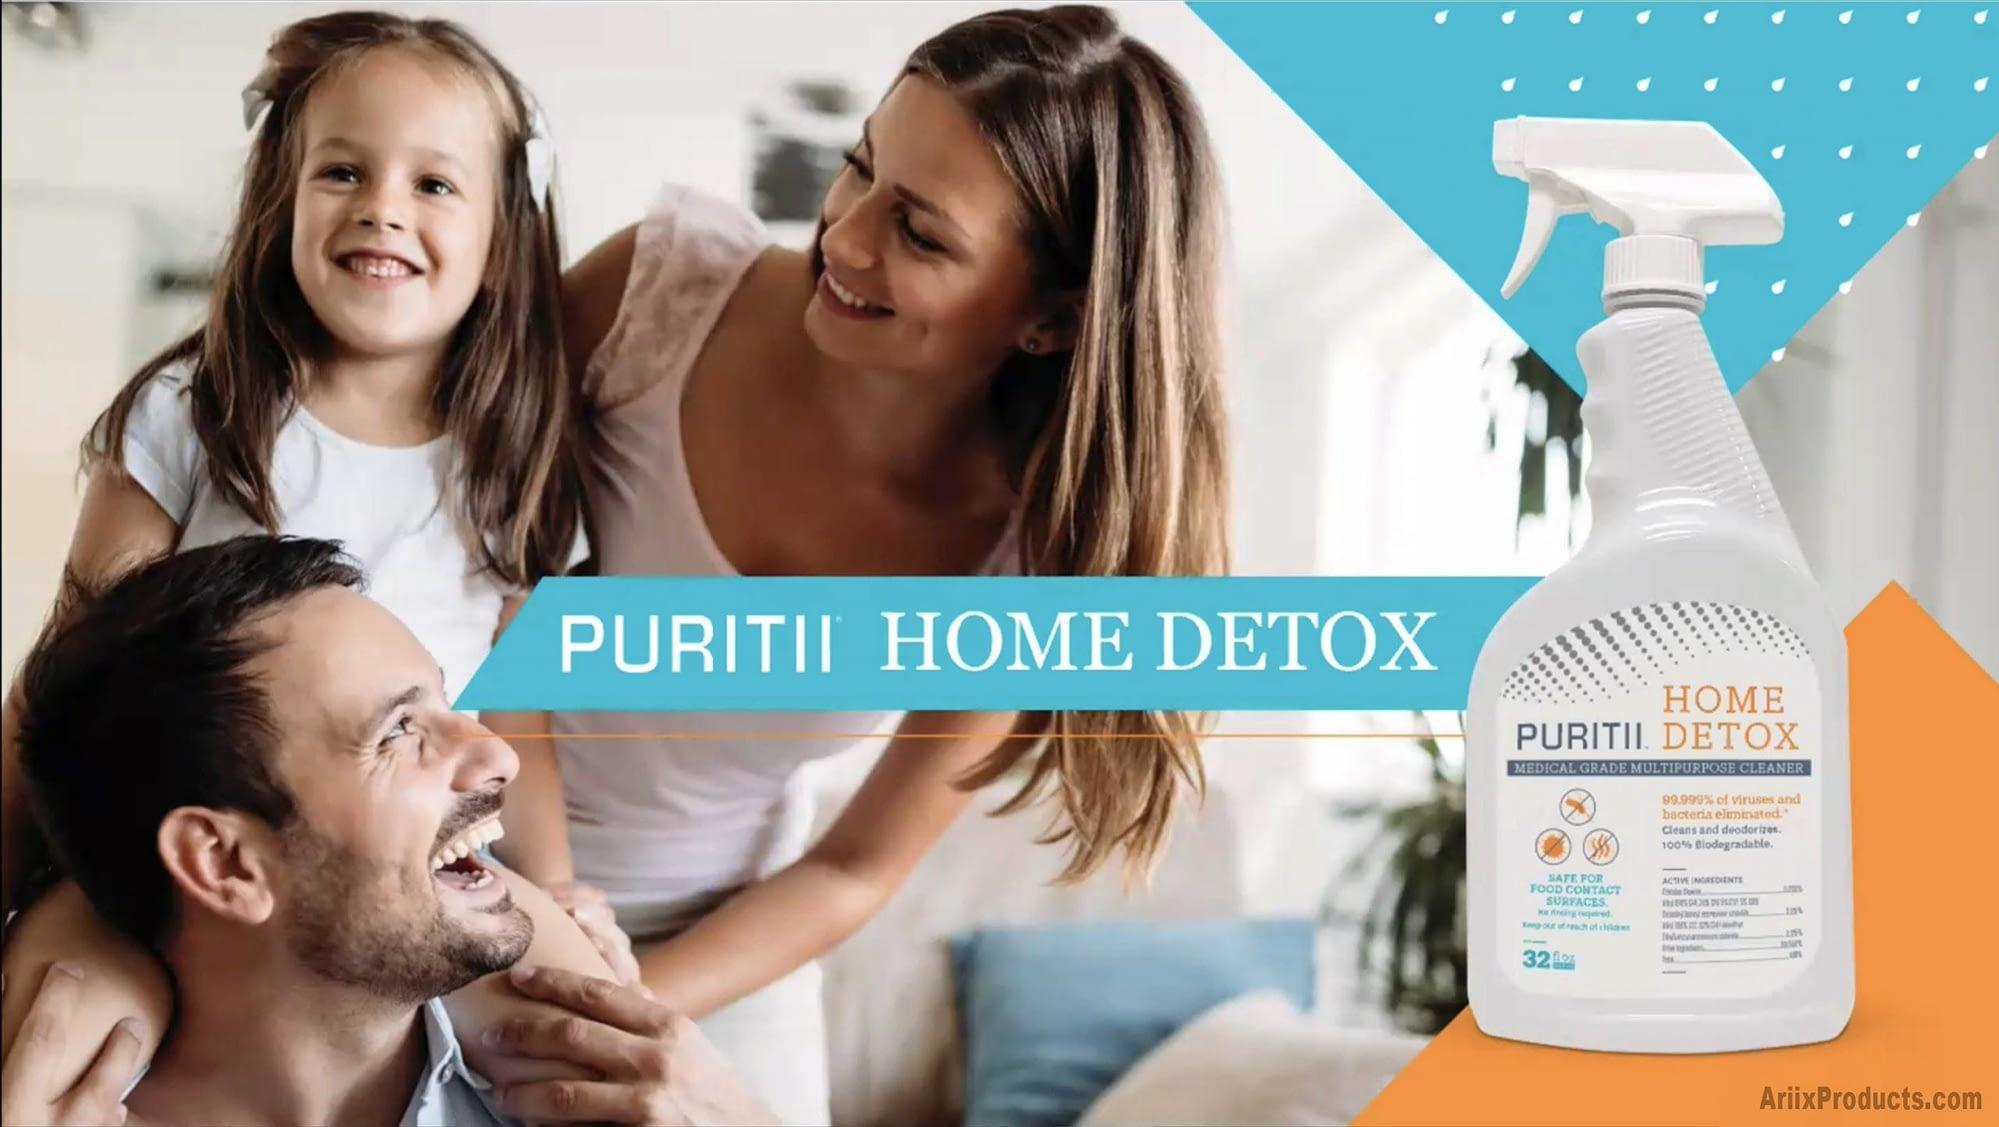 00 Home Detox